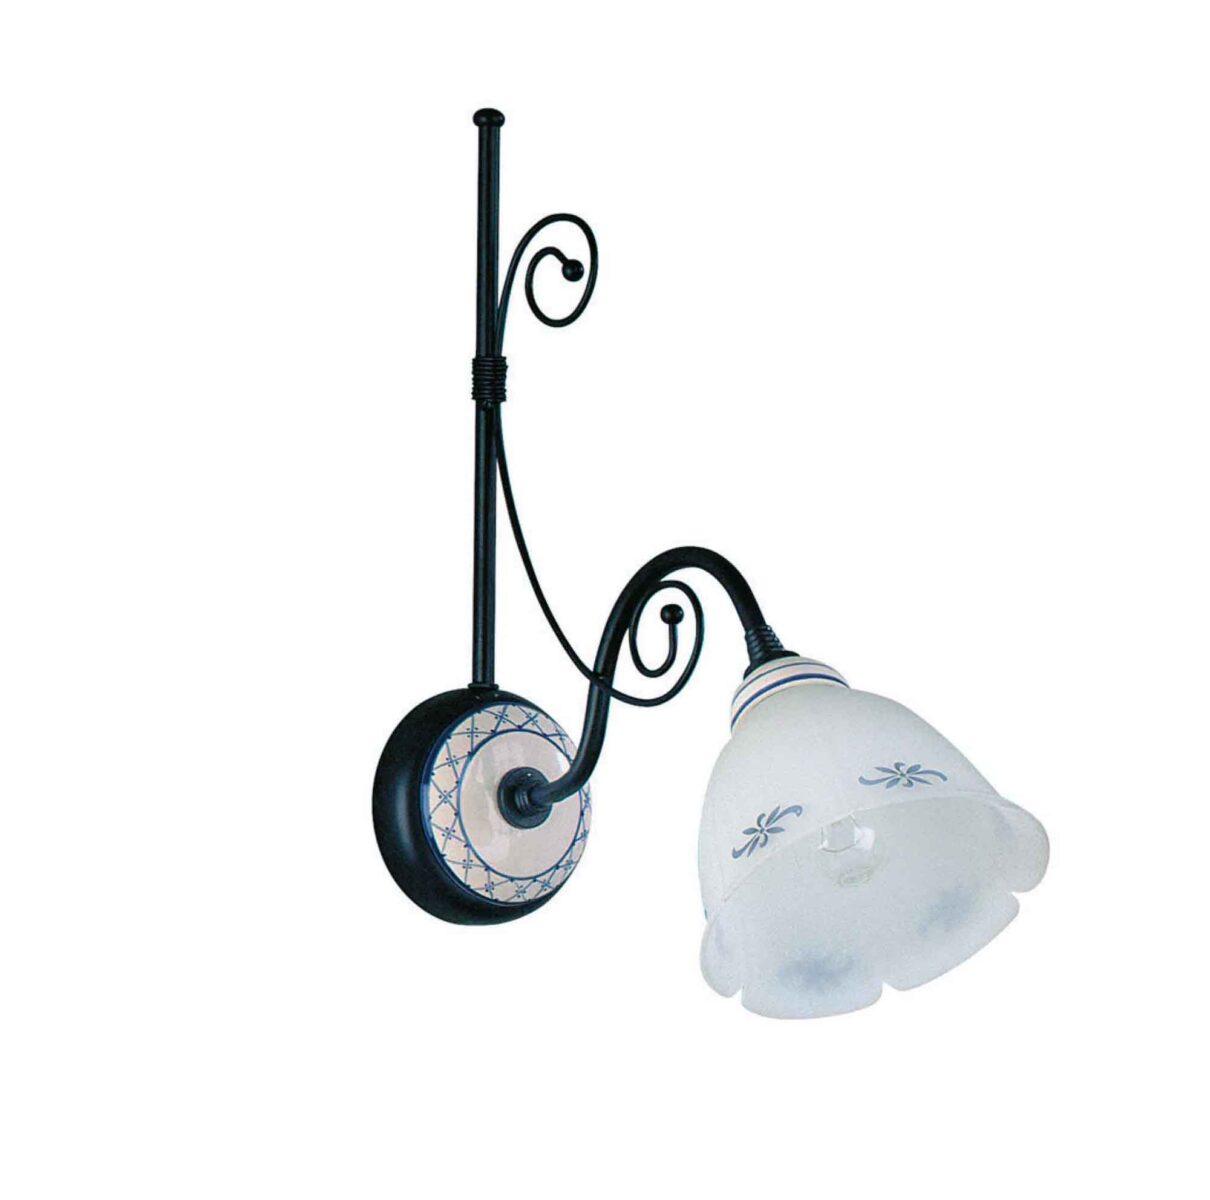 lampadari plafoniere : ... lampadari plafoniere applique napoli fabbrica lampadari plafoniere